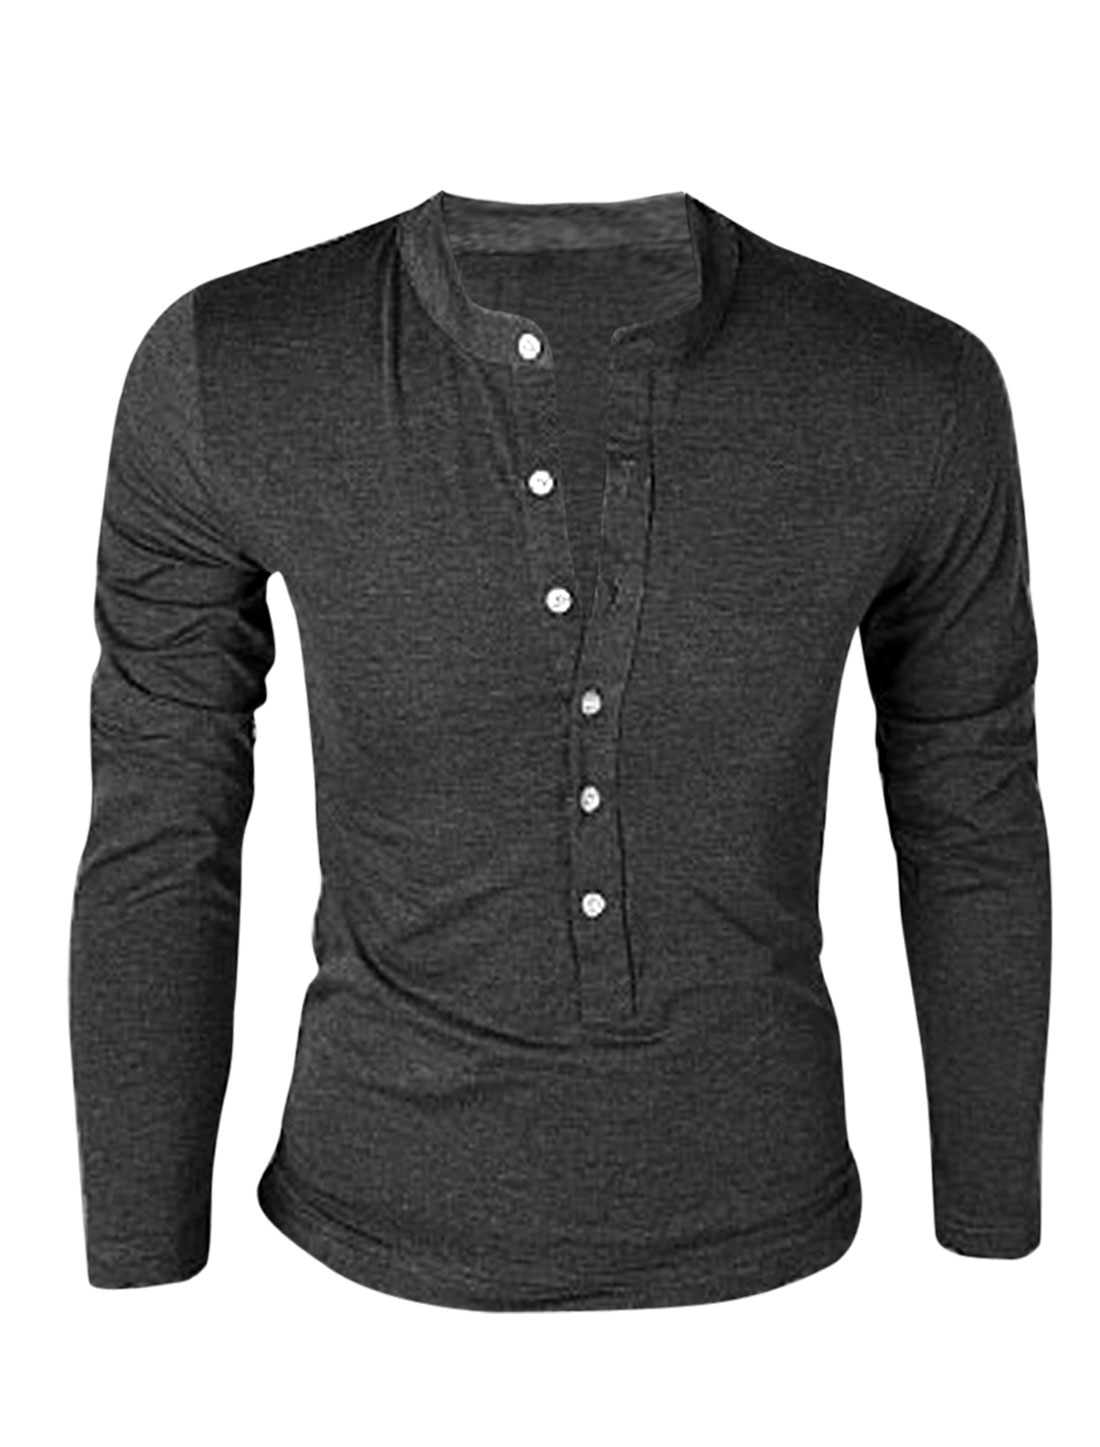 Men Stand Collar Button Closure Long Sleeve Pullover T-Shirt Dark Gray M